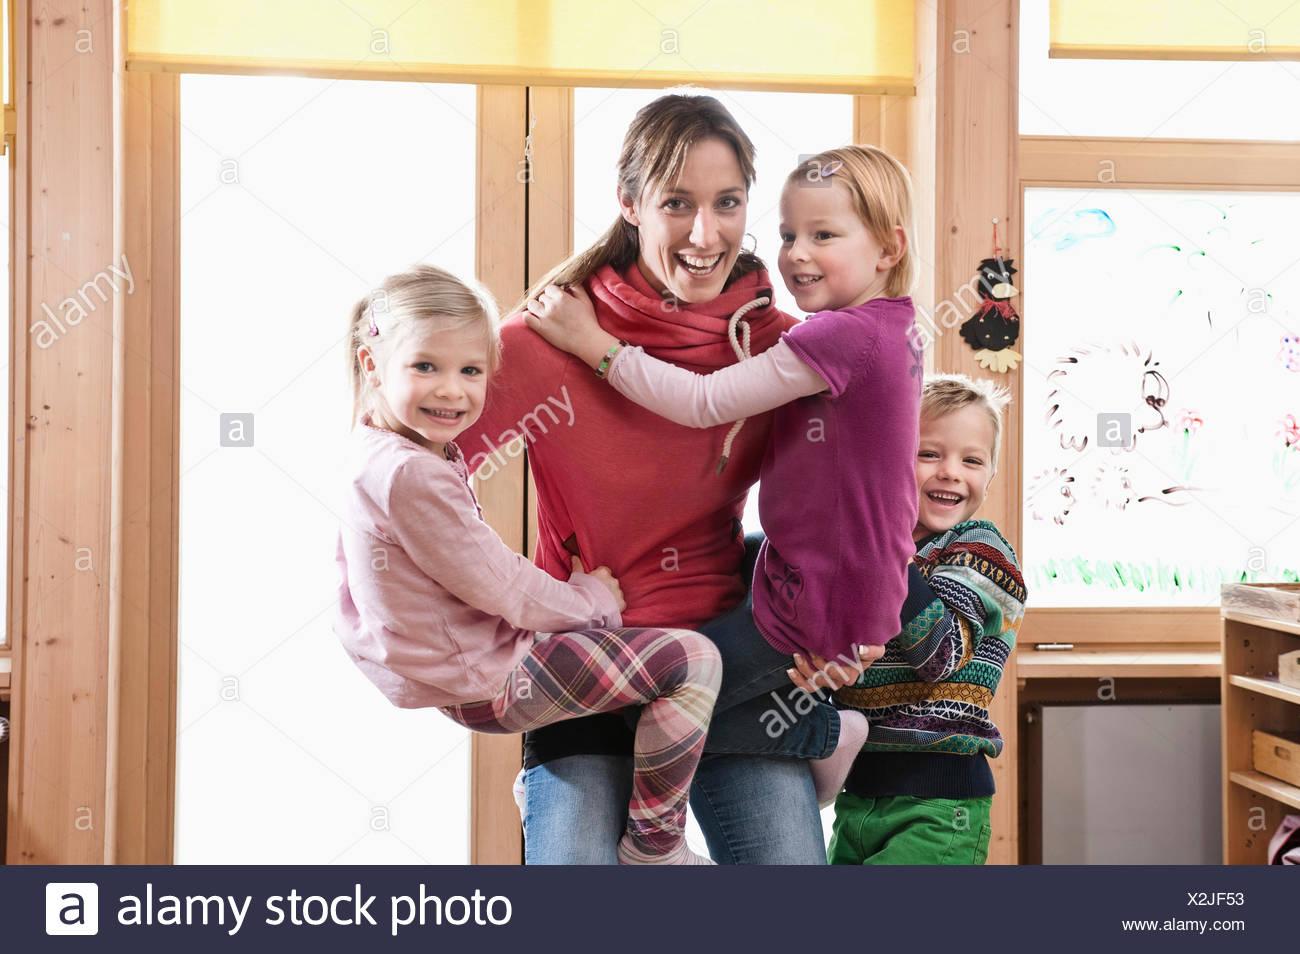 Female educator rampaging with three kids in kindergarten - Stock Image